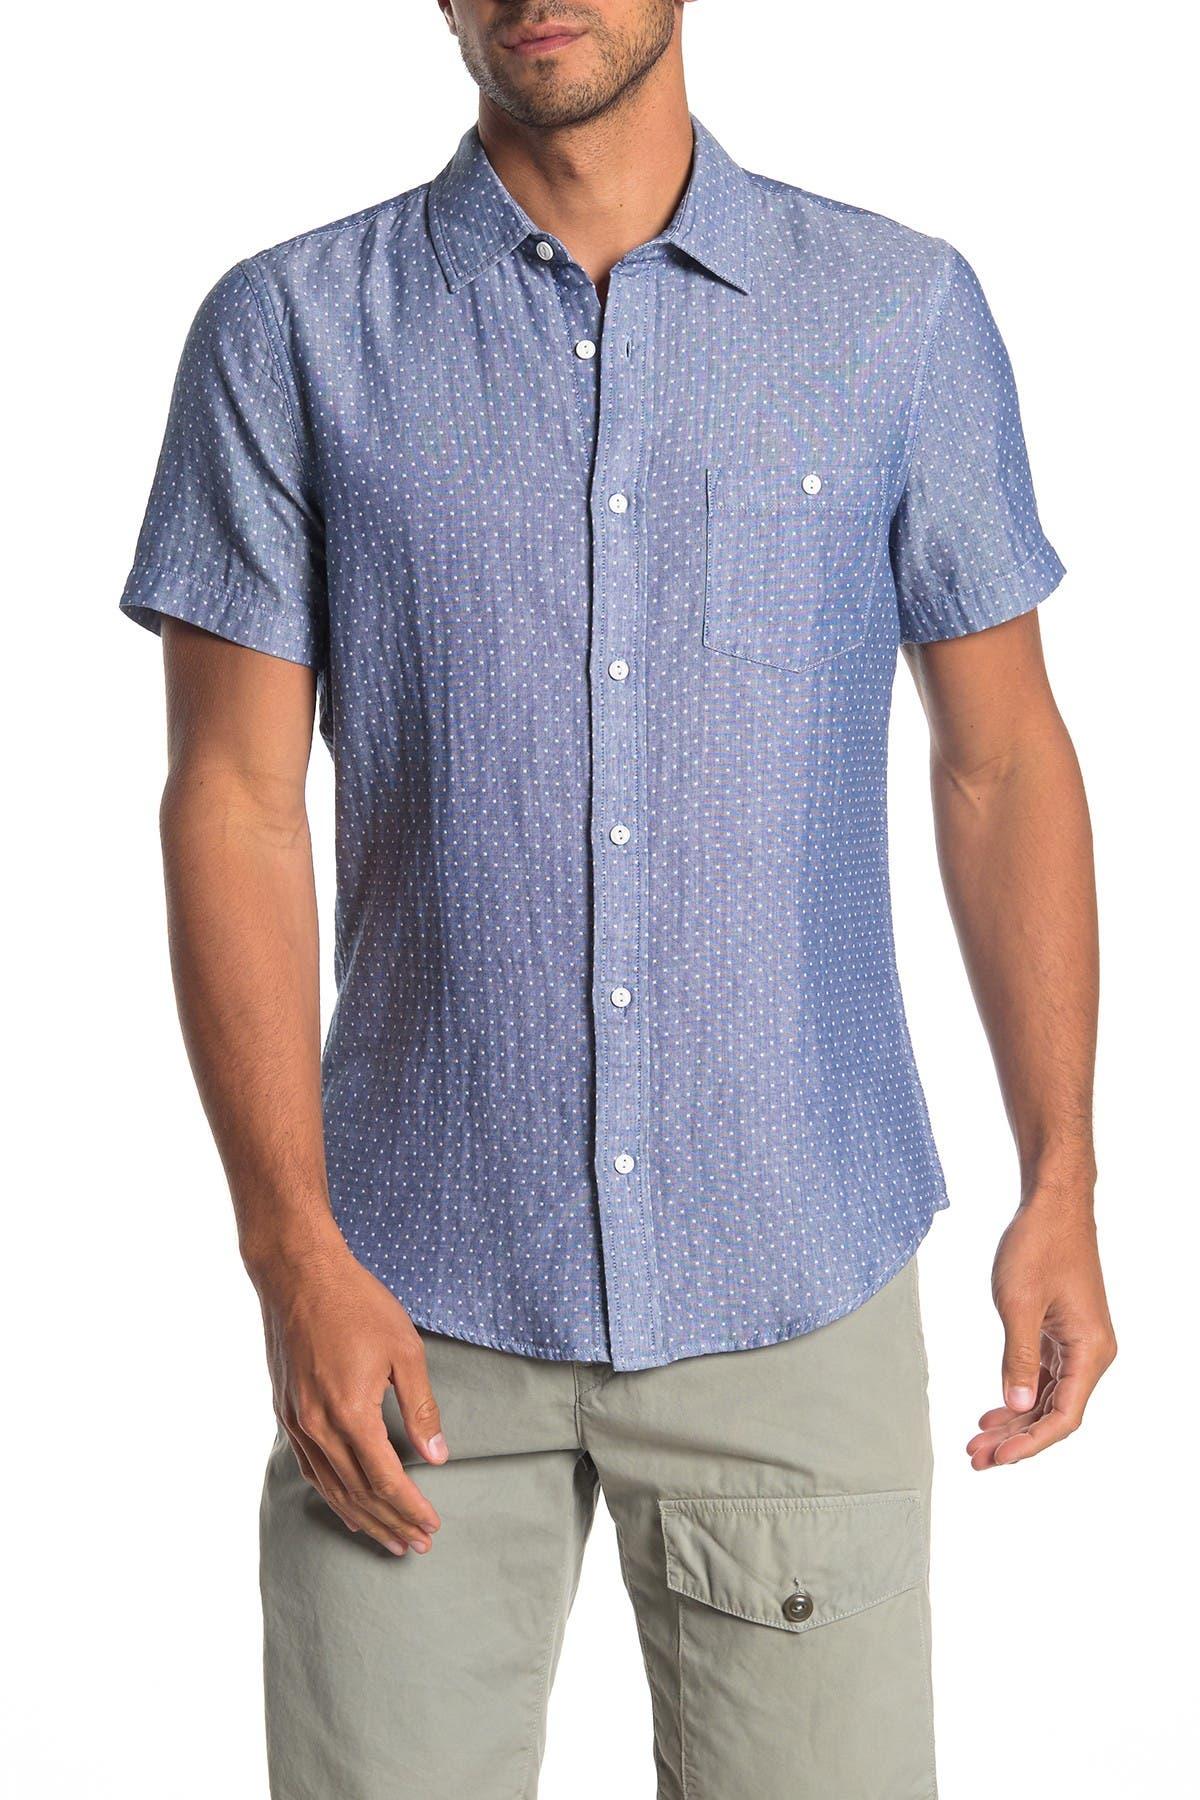 Image of WALLIN & BROS Dobby Short Sleeve Slim Fit Shirt